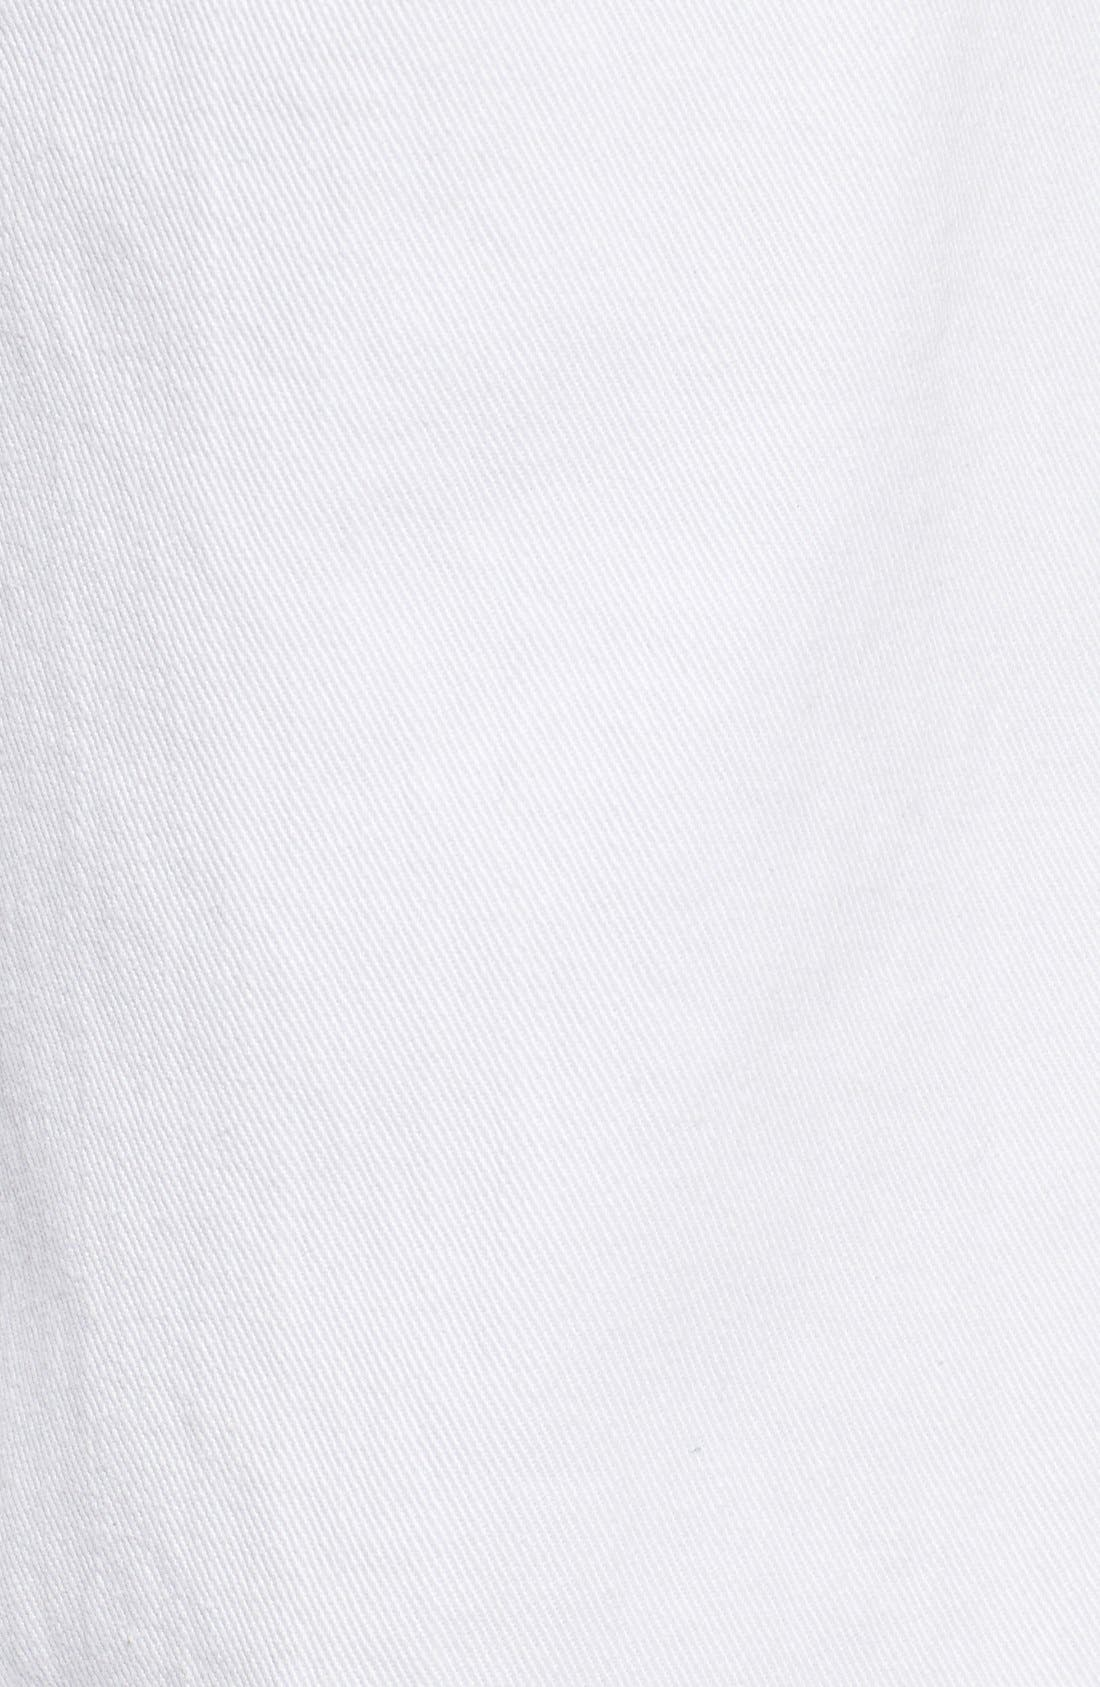 'Libby' Wide Leg Sailor Jeans,                             Alternate thumbnail 5, color,                             White2